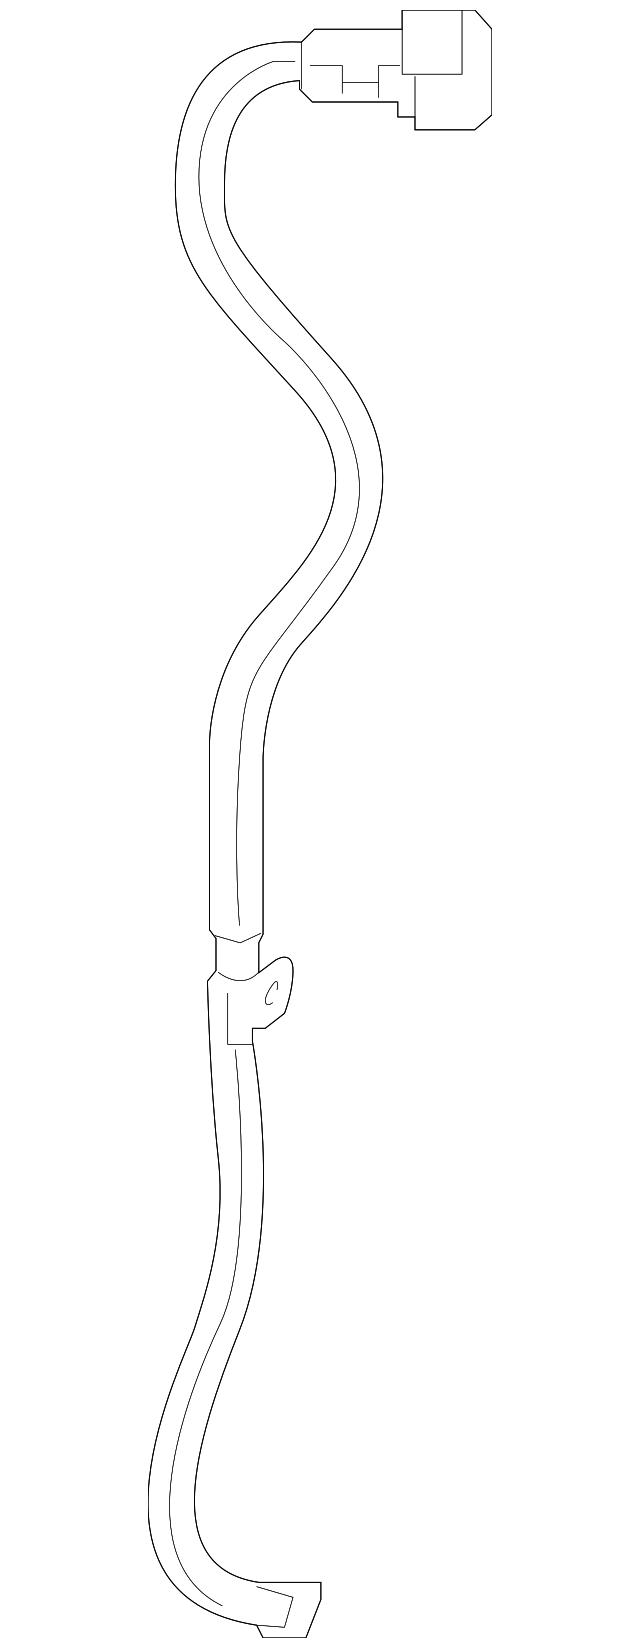 negative cable